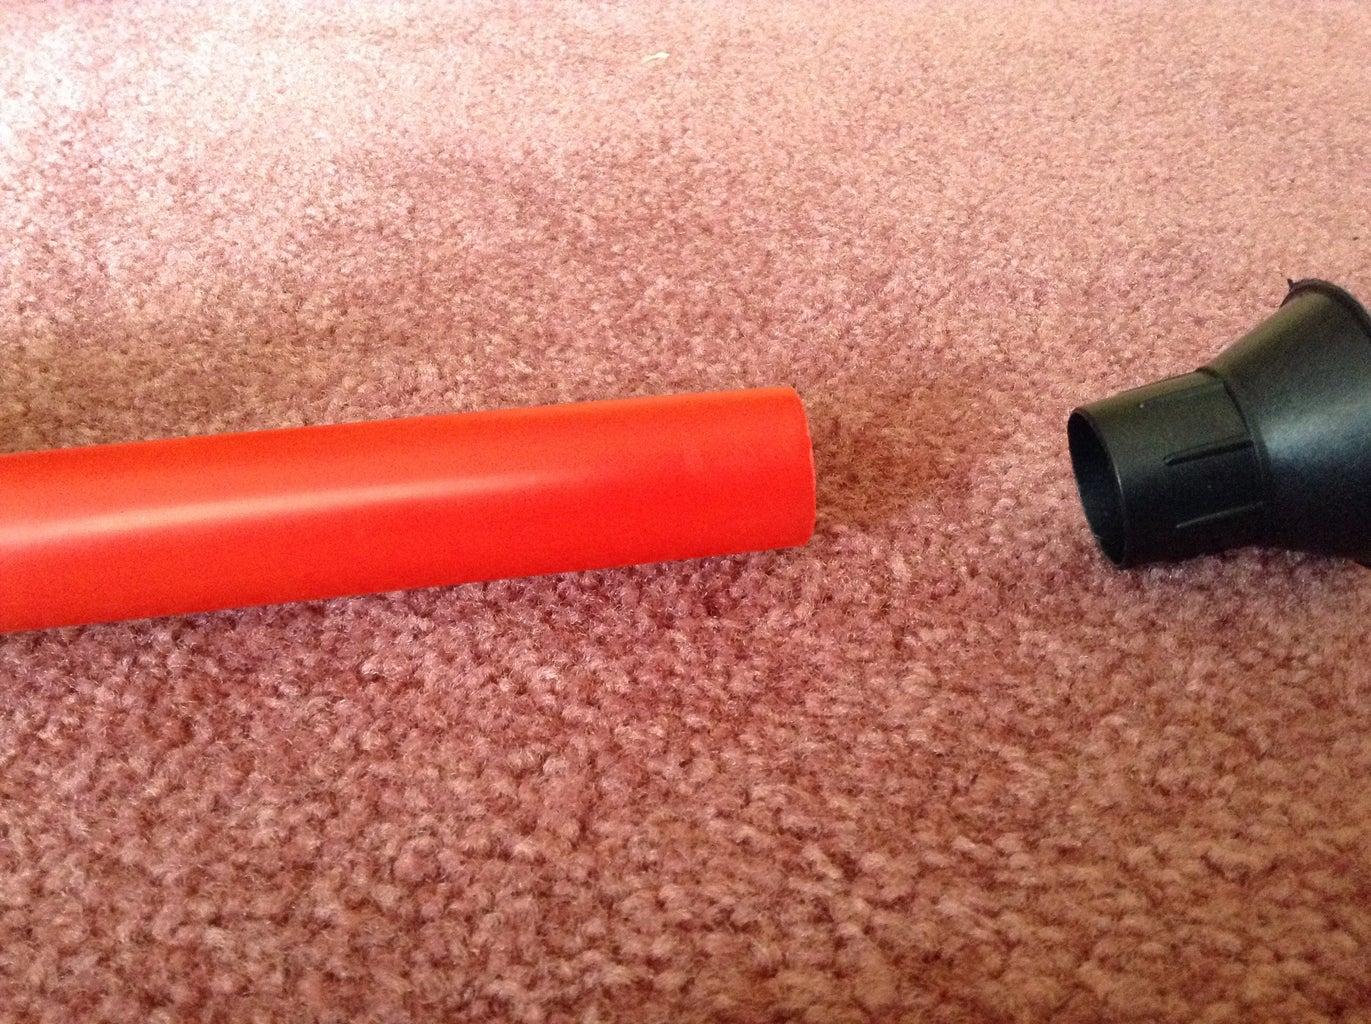 Disassembling the Ninja Blowpipe